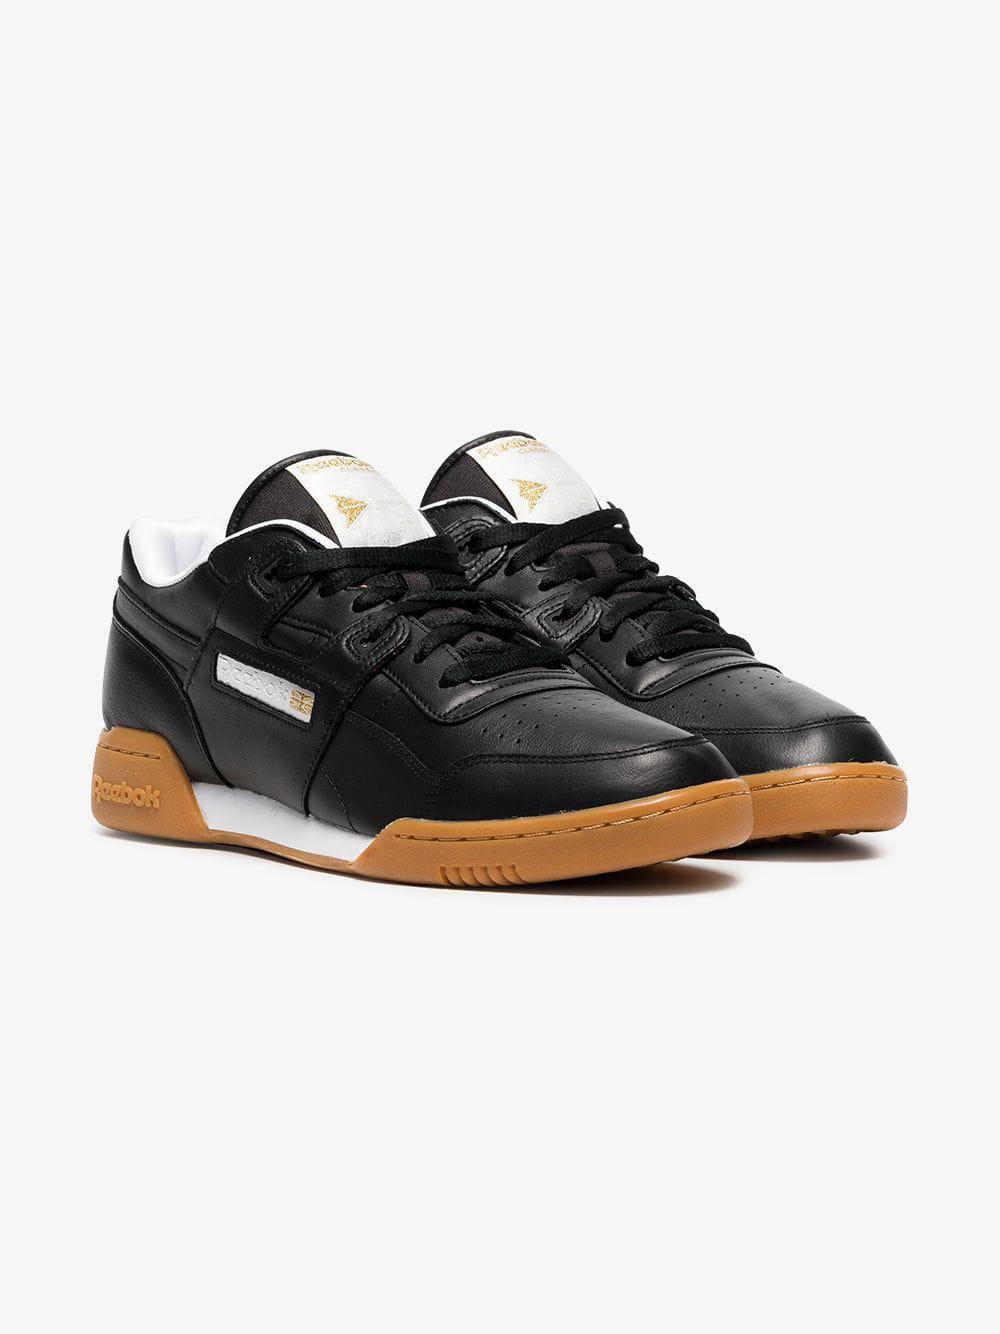 907130eb1c16 Lyst - Reebok Black Workout Plus Mu Sneakers in Black for Men - Save 5%